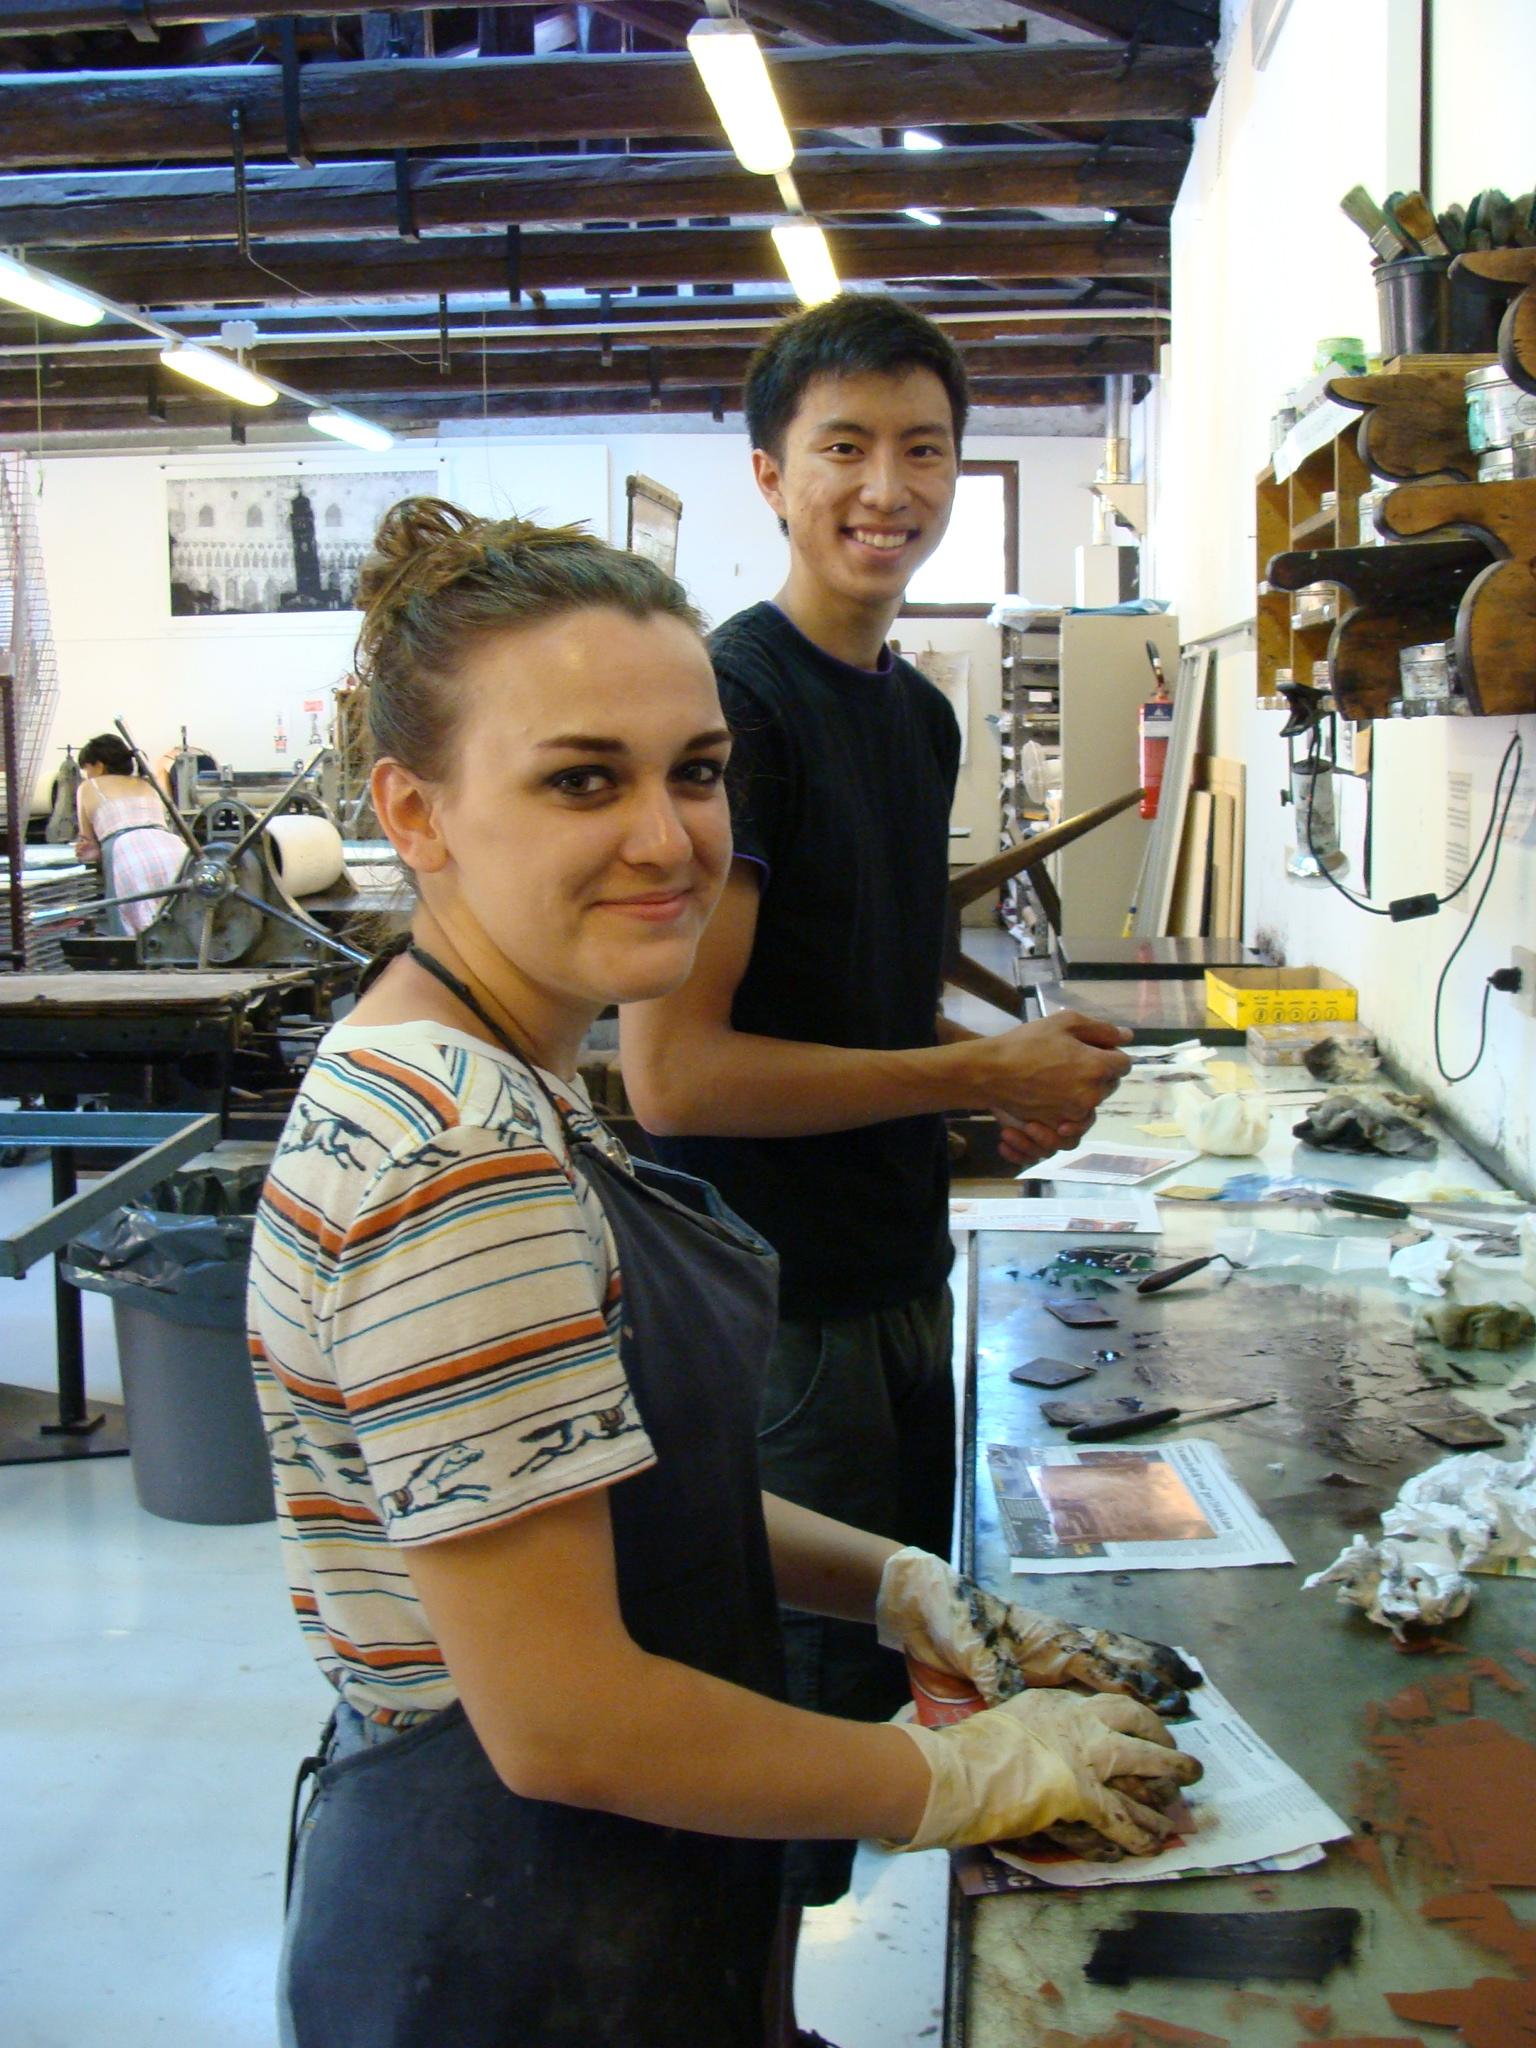 Students Michele Jenkins and Paul Lee at work in the Scuola di Grafica printmaking studio (photo: Kelly Davis).